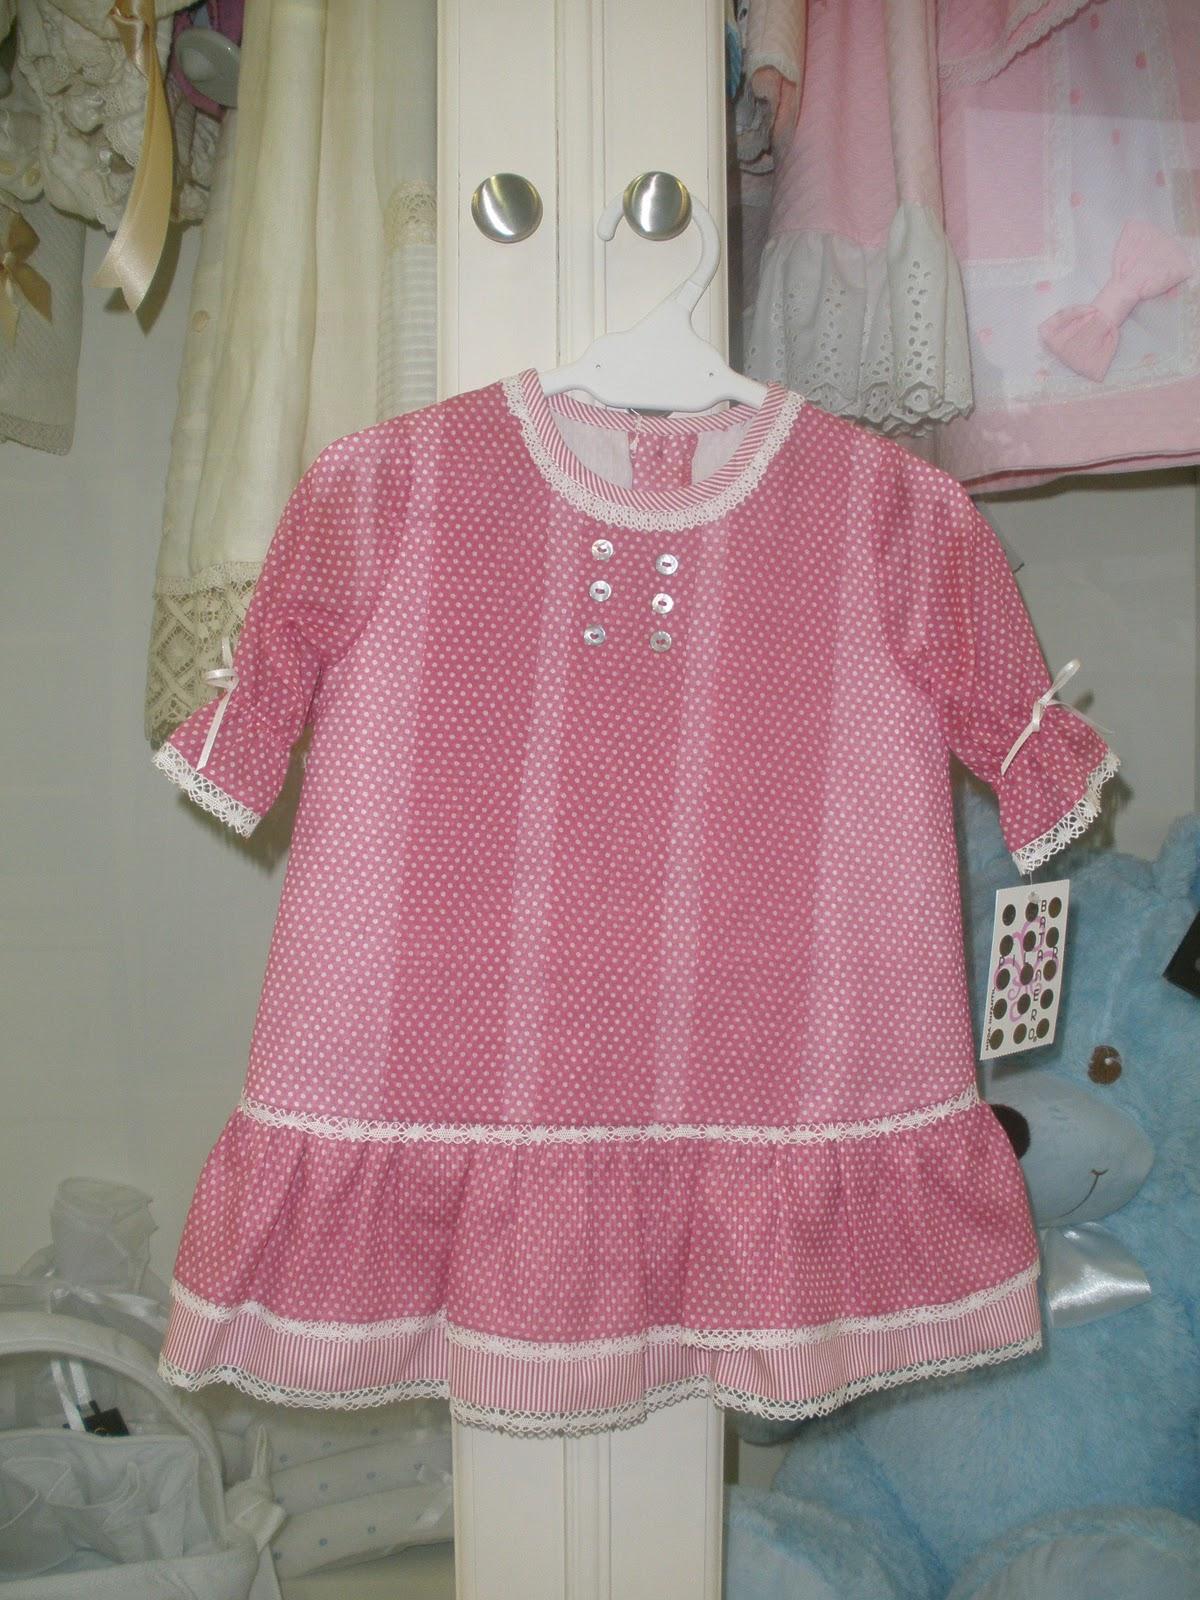 Carolina moda infantil nueva colecci n pilar batanero - Monalisa moda infantil ...